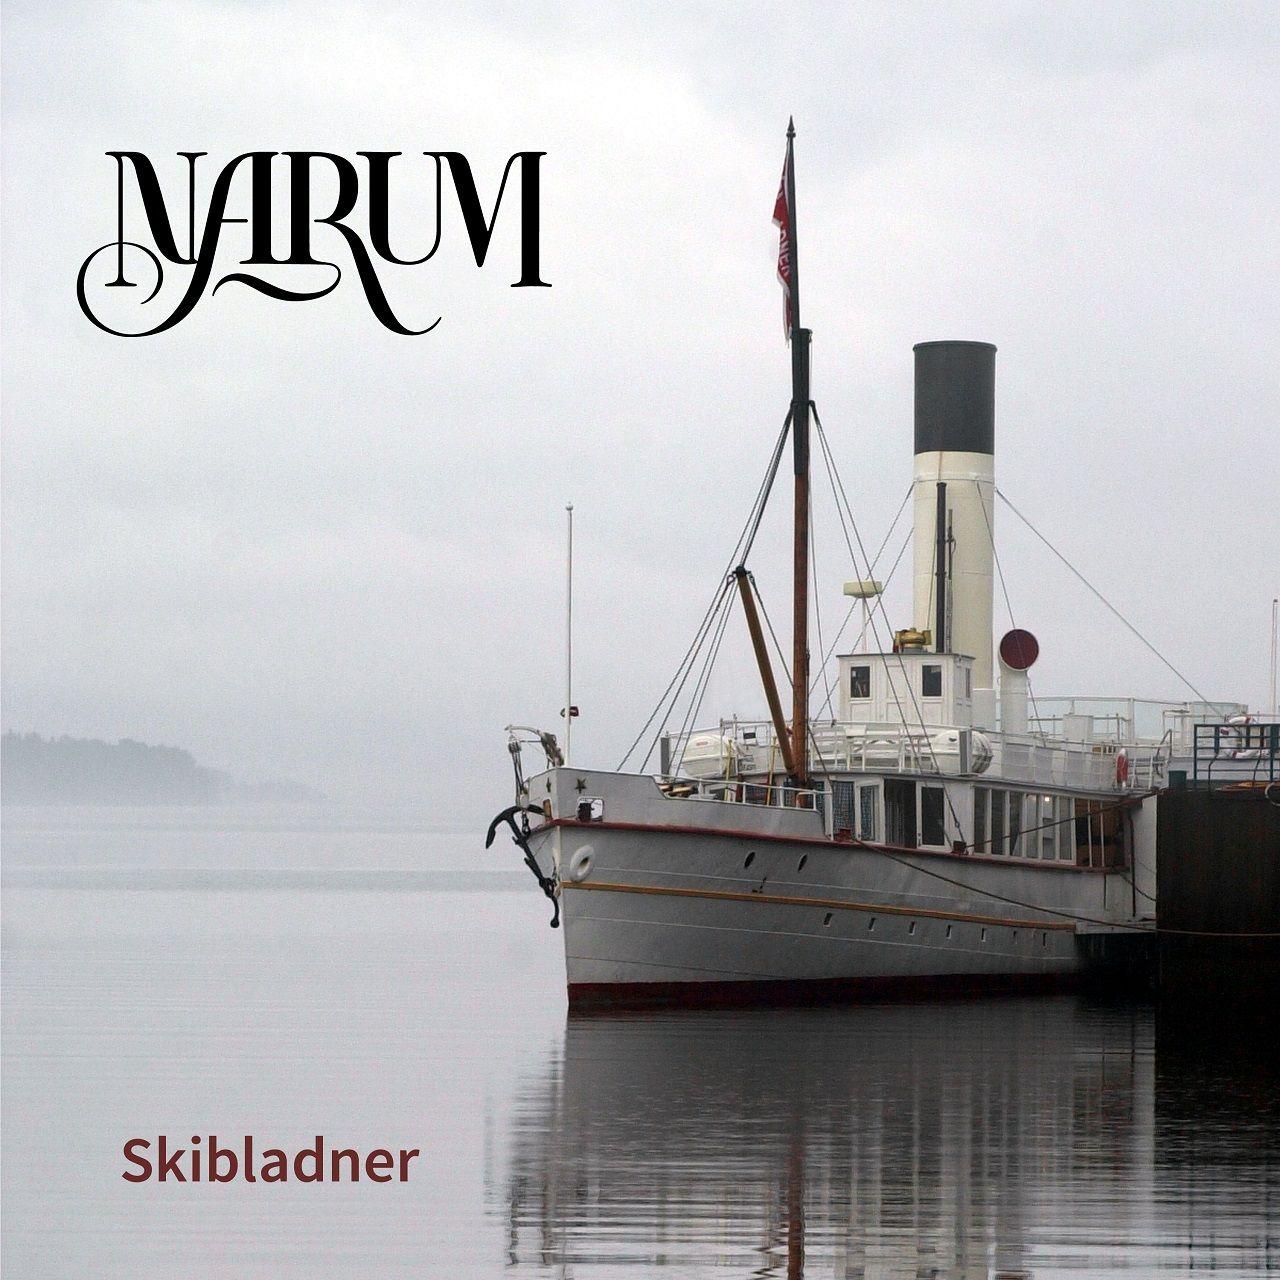 Plateomslag - Skibladner - Marum - drabantmusic.no